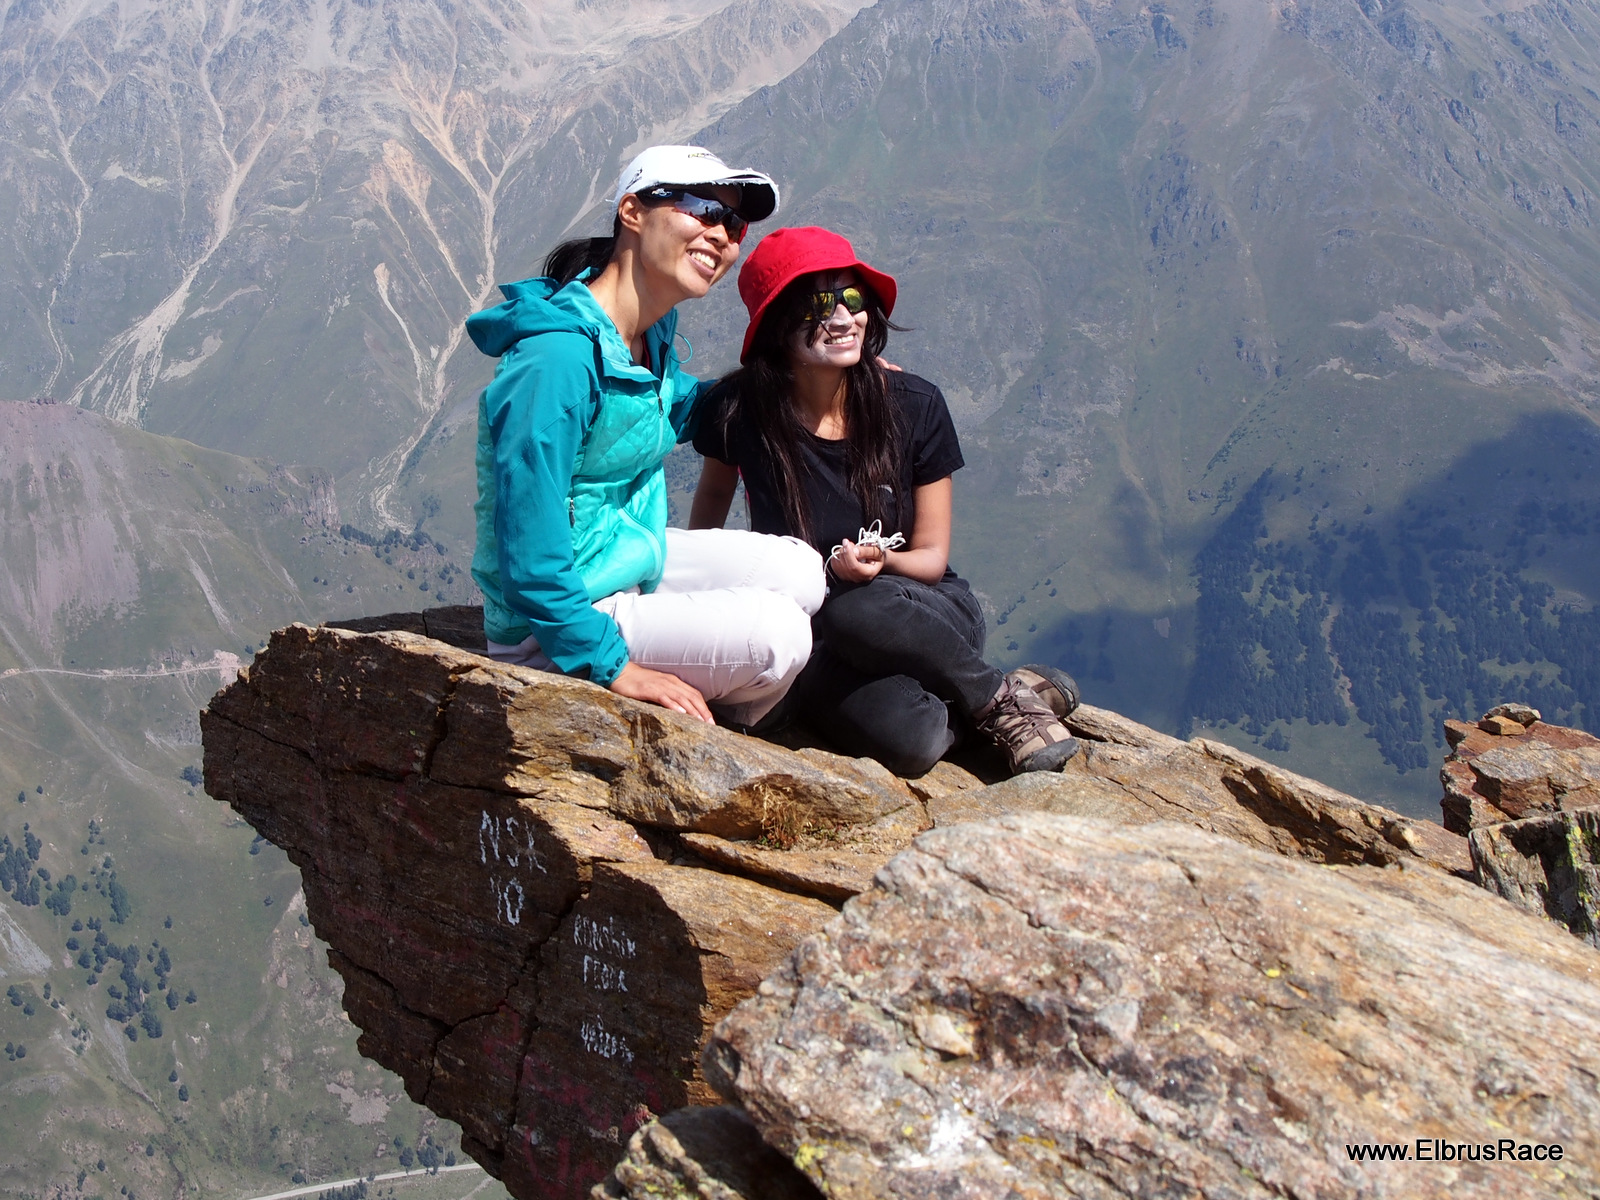 elbrus-race-2014-mars-one-ritika-singh-003